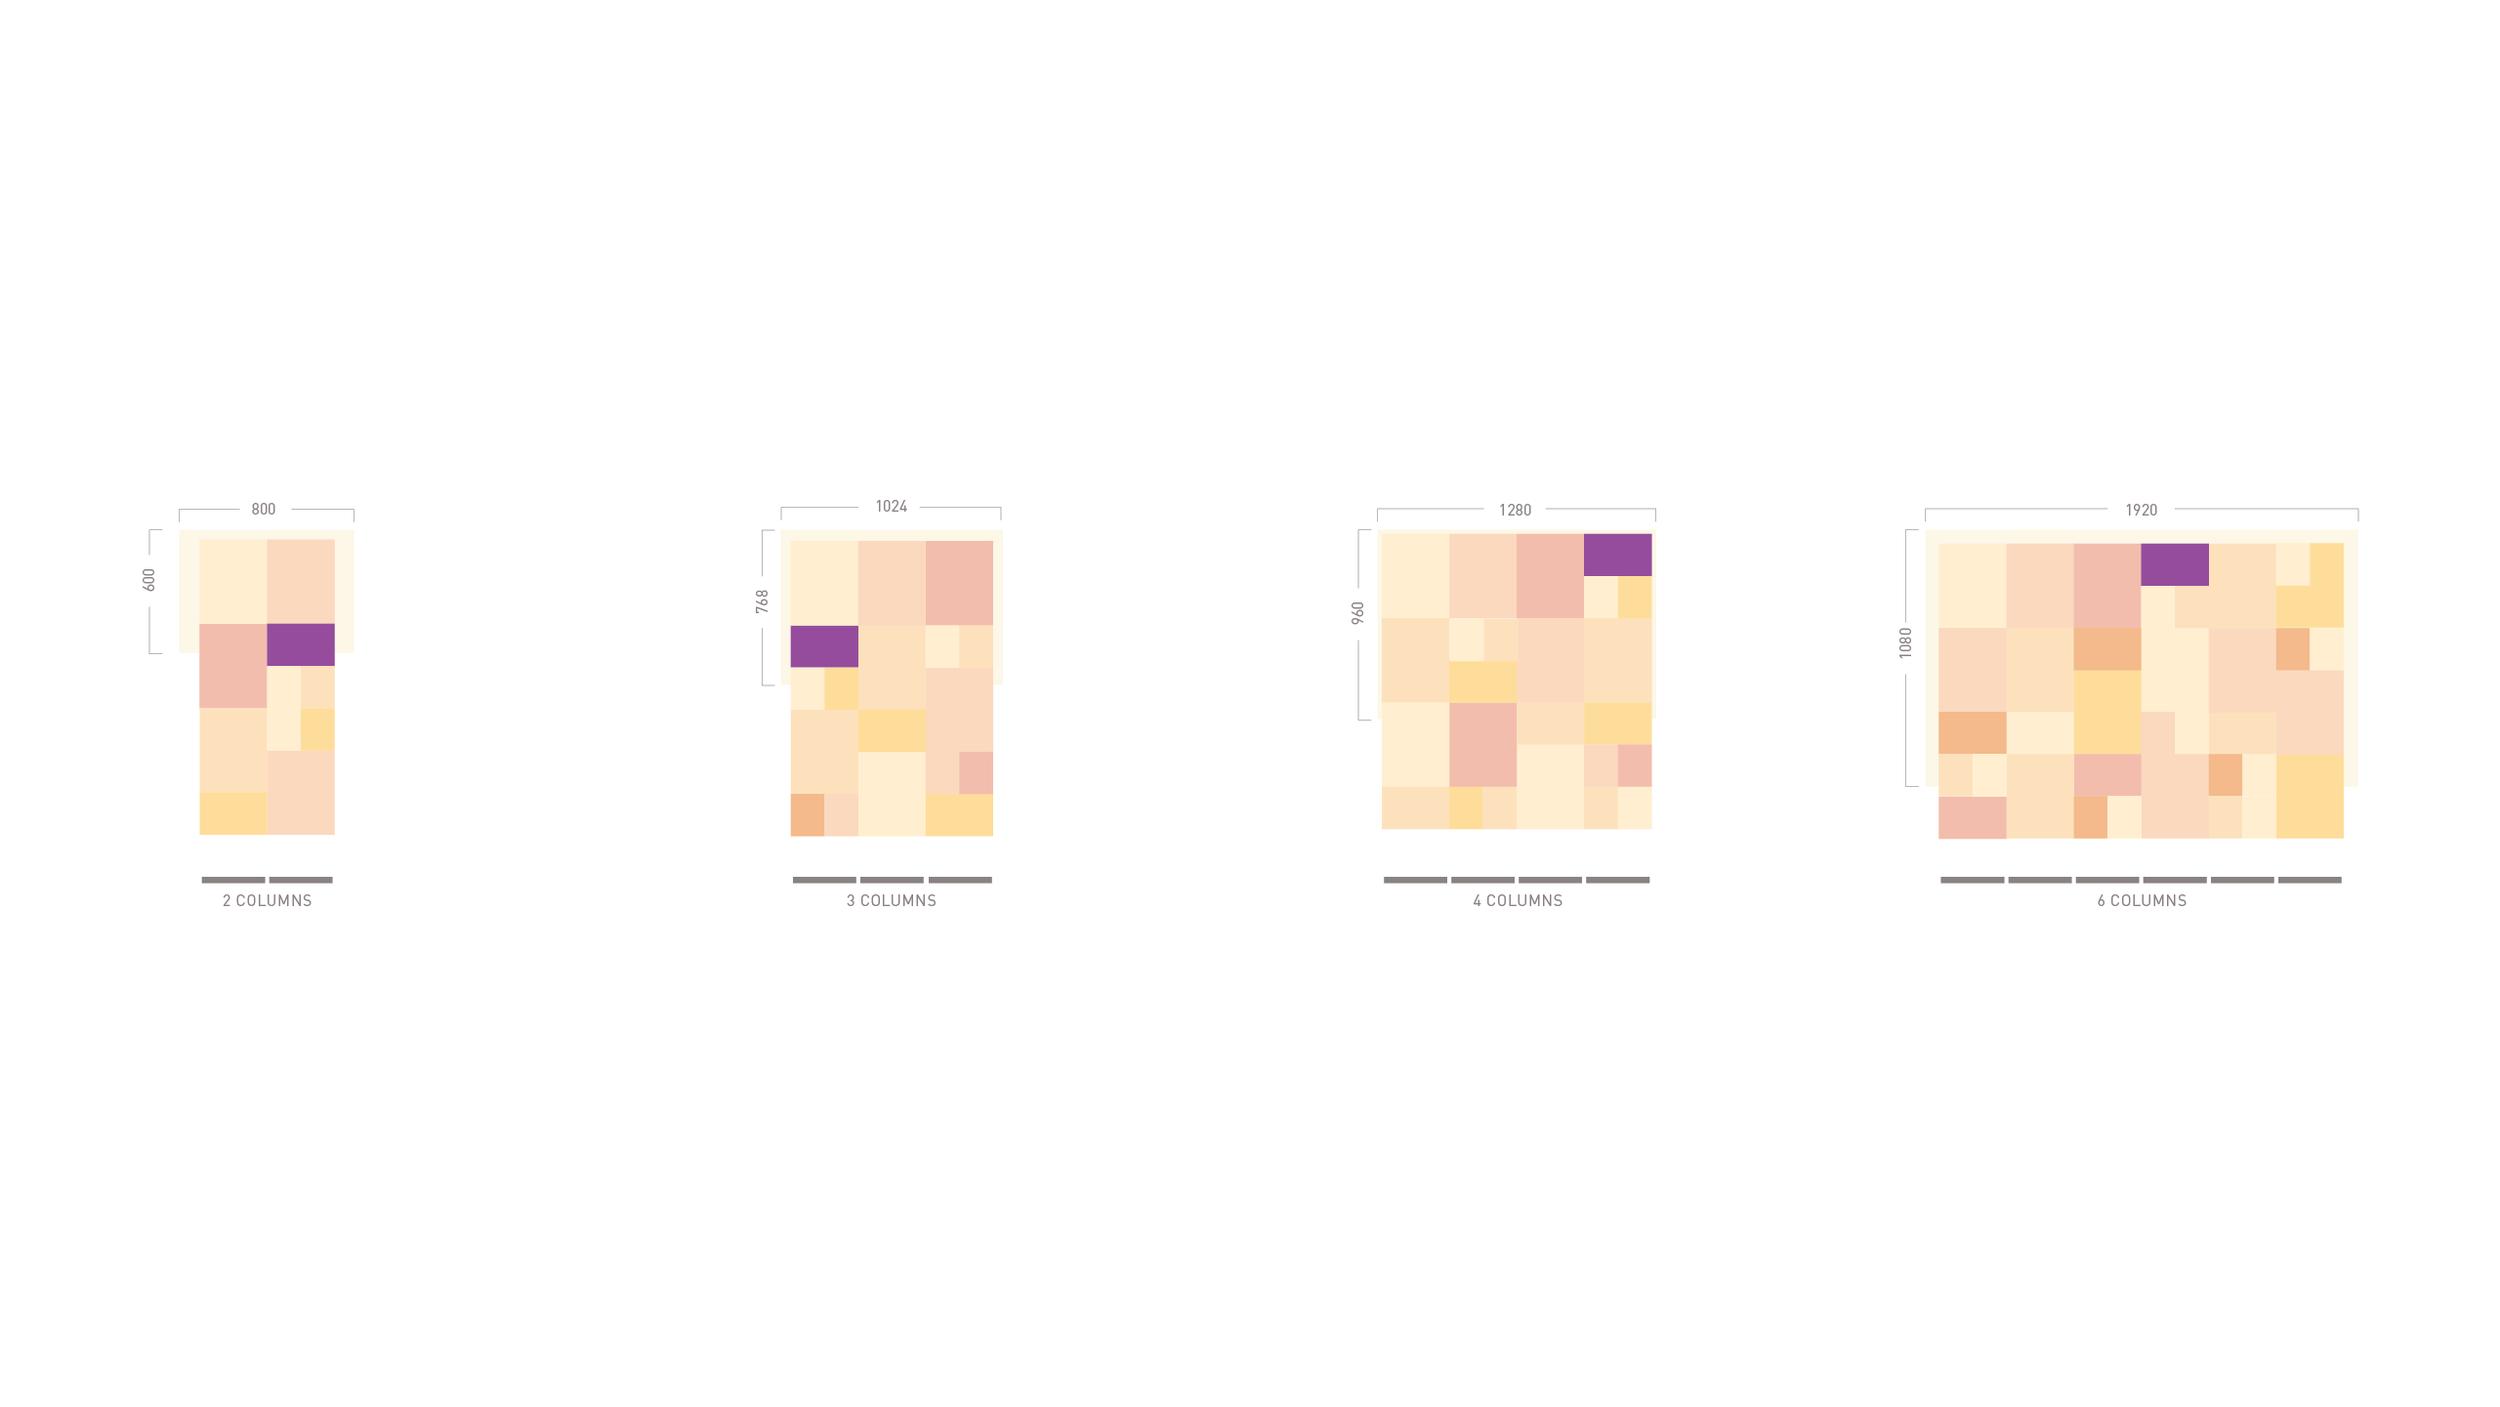 Yoplait_PresentationIllustrations_02_800_1024_05.png